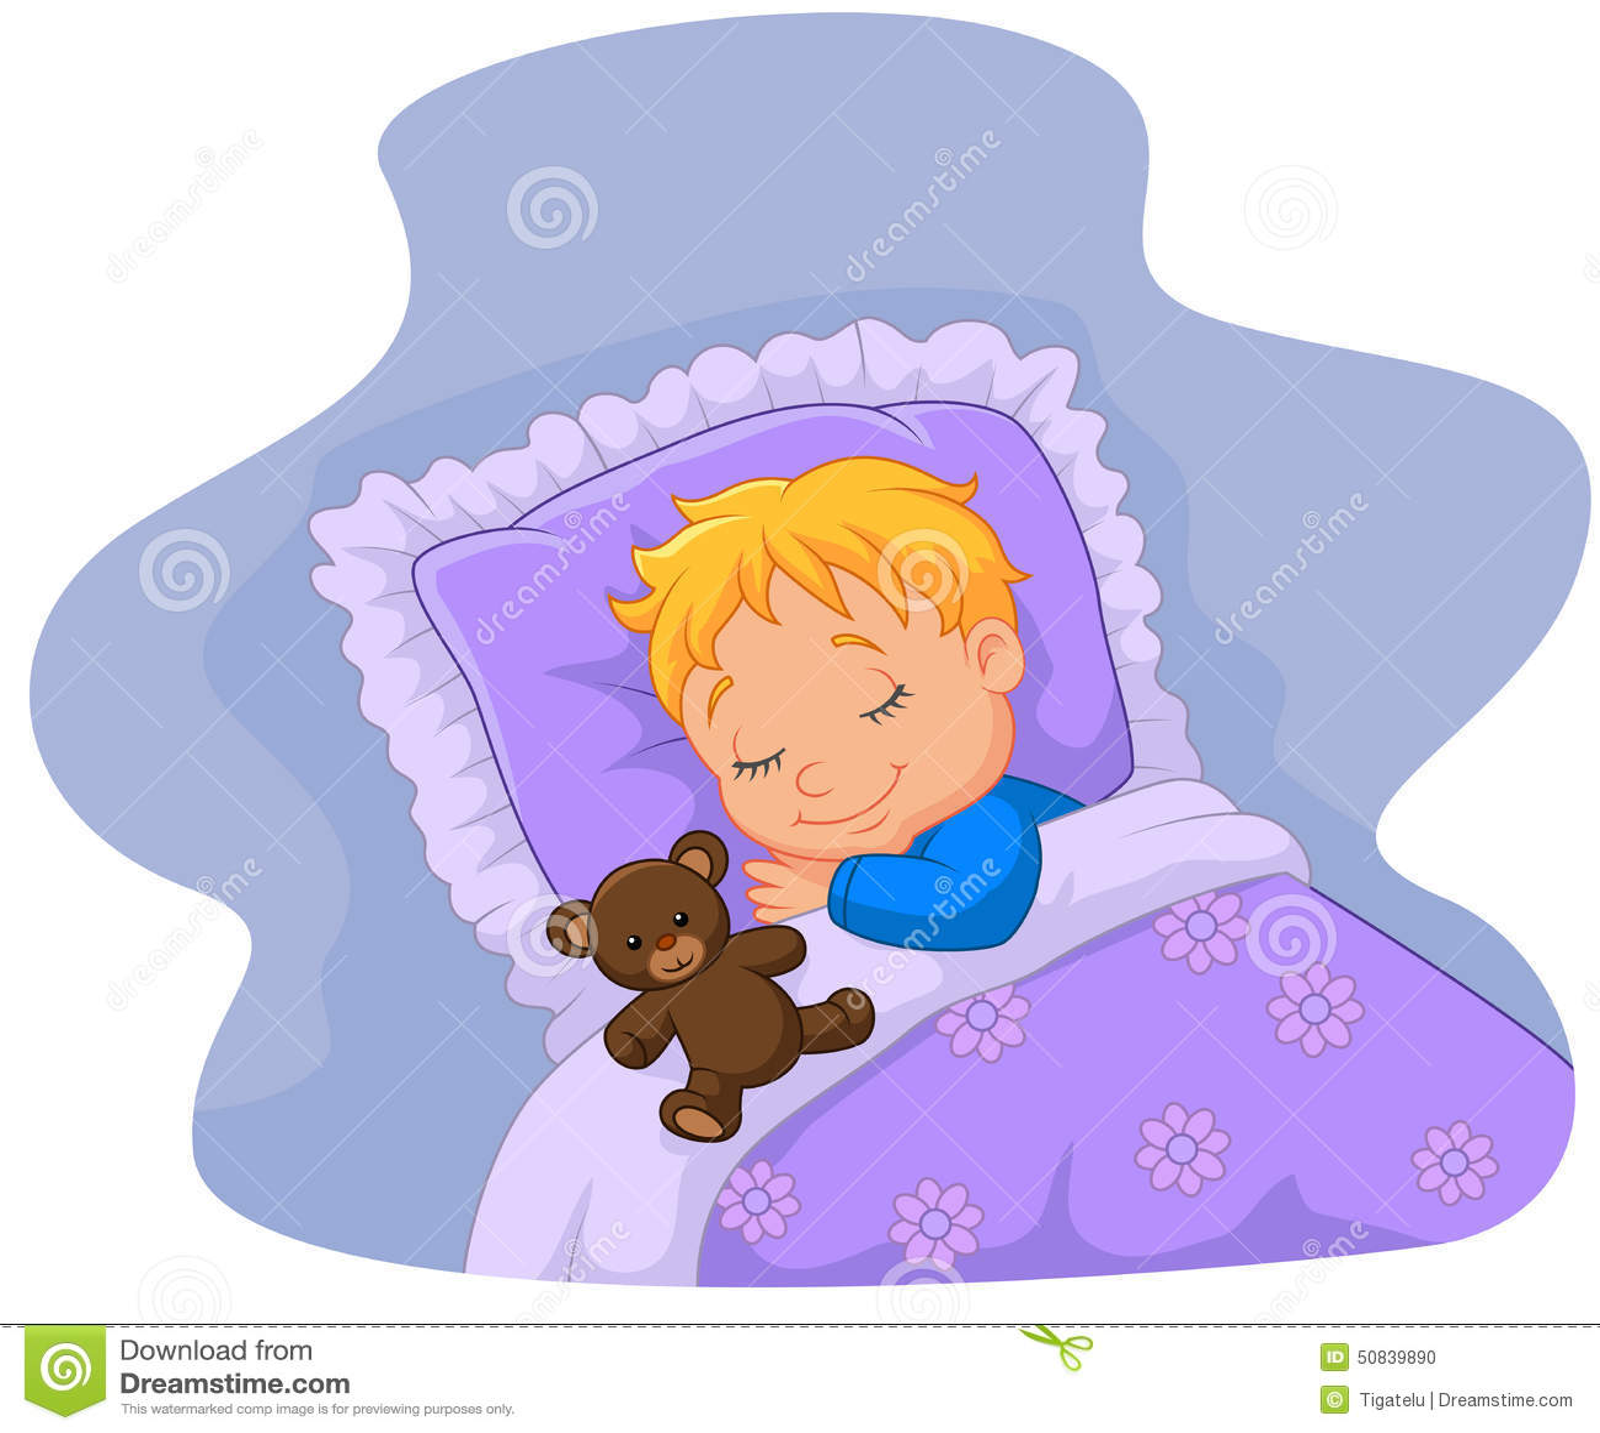 Cartoon Baby Sleeping With Teddy Bear Stock Vector ... - photo#6